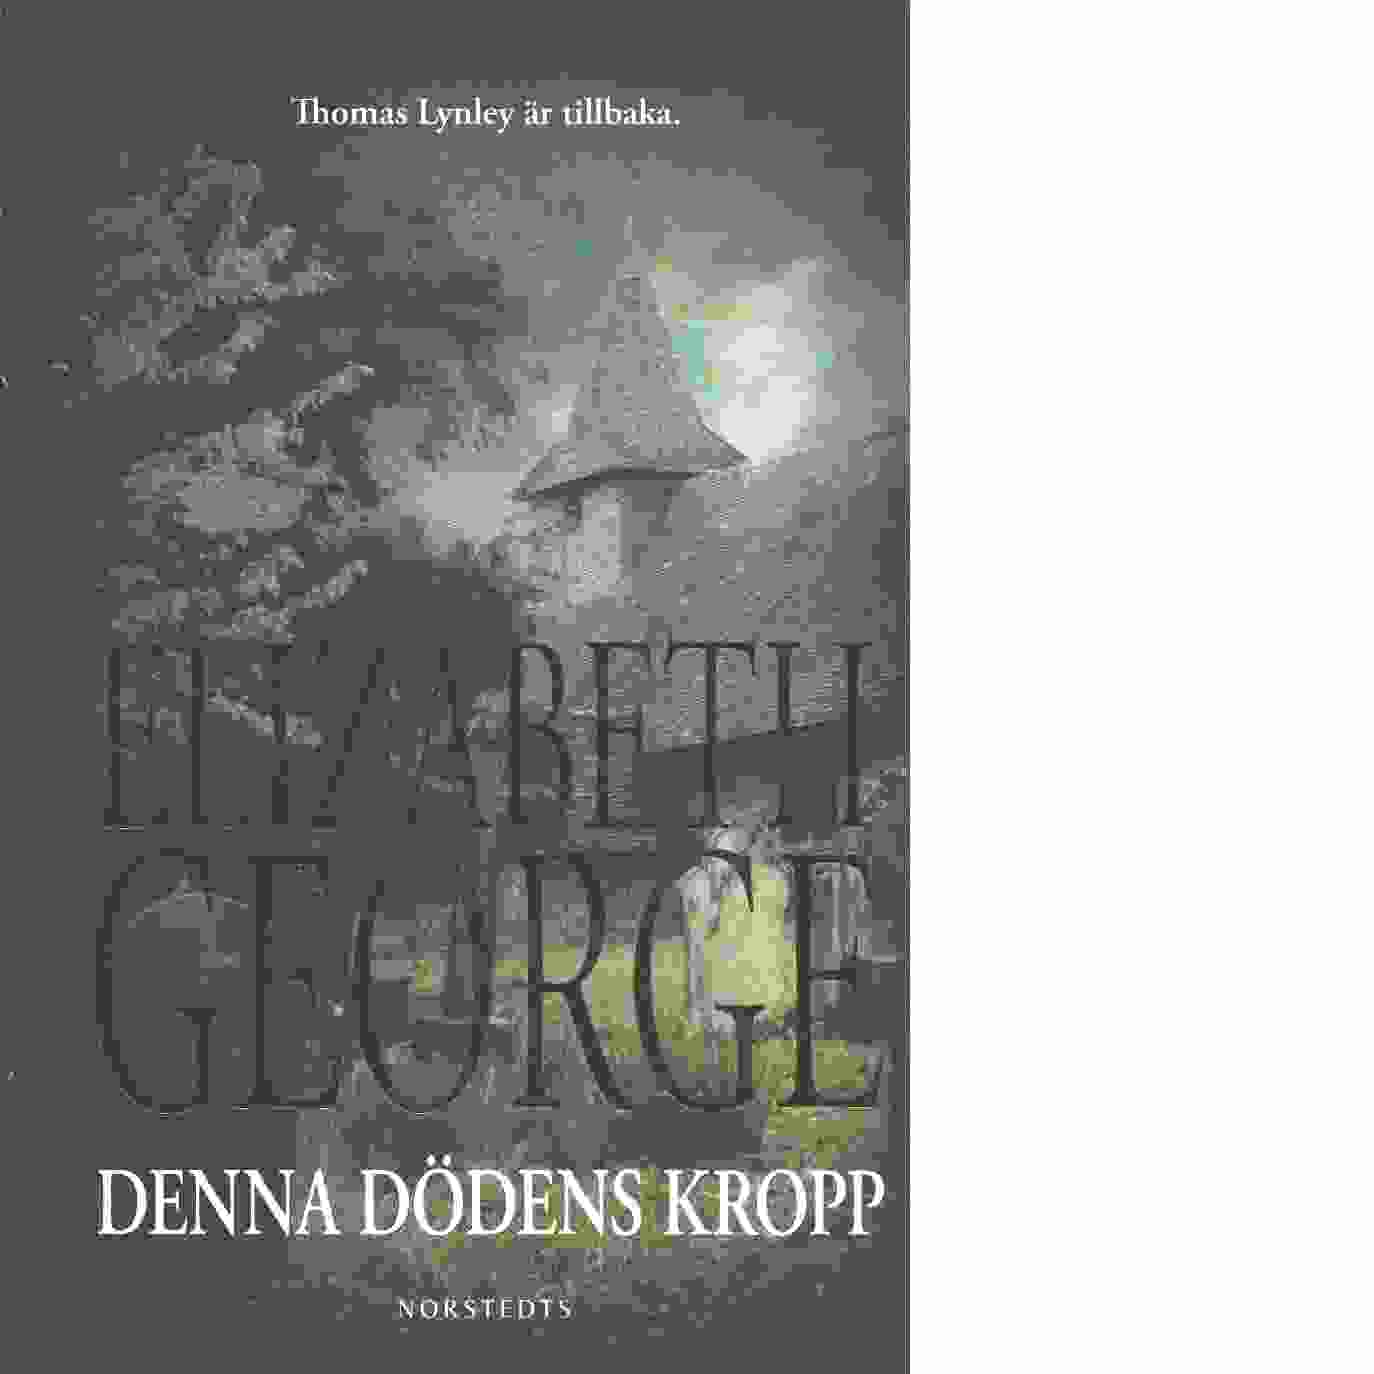 Denna dödens kropp - George, Elizabeth